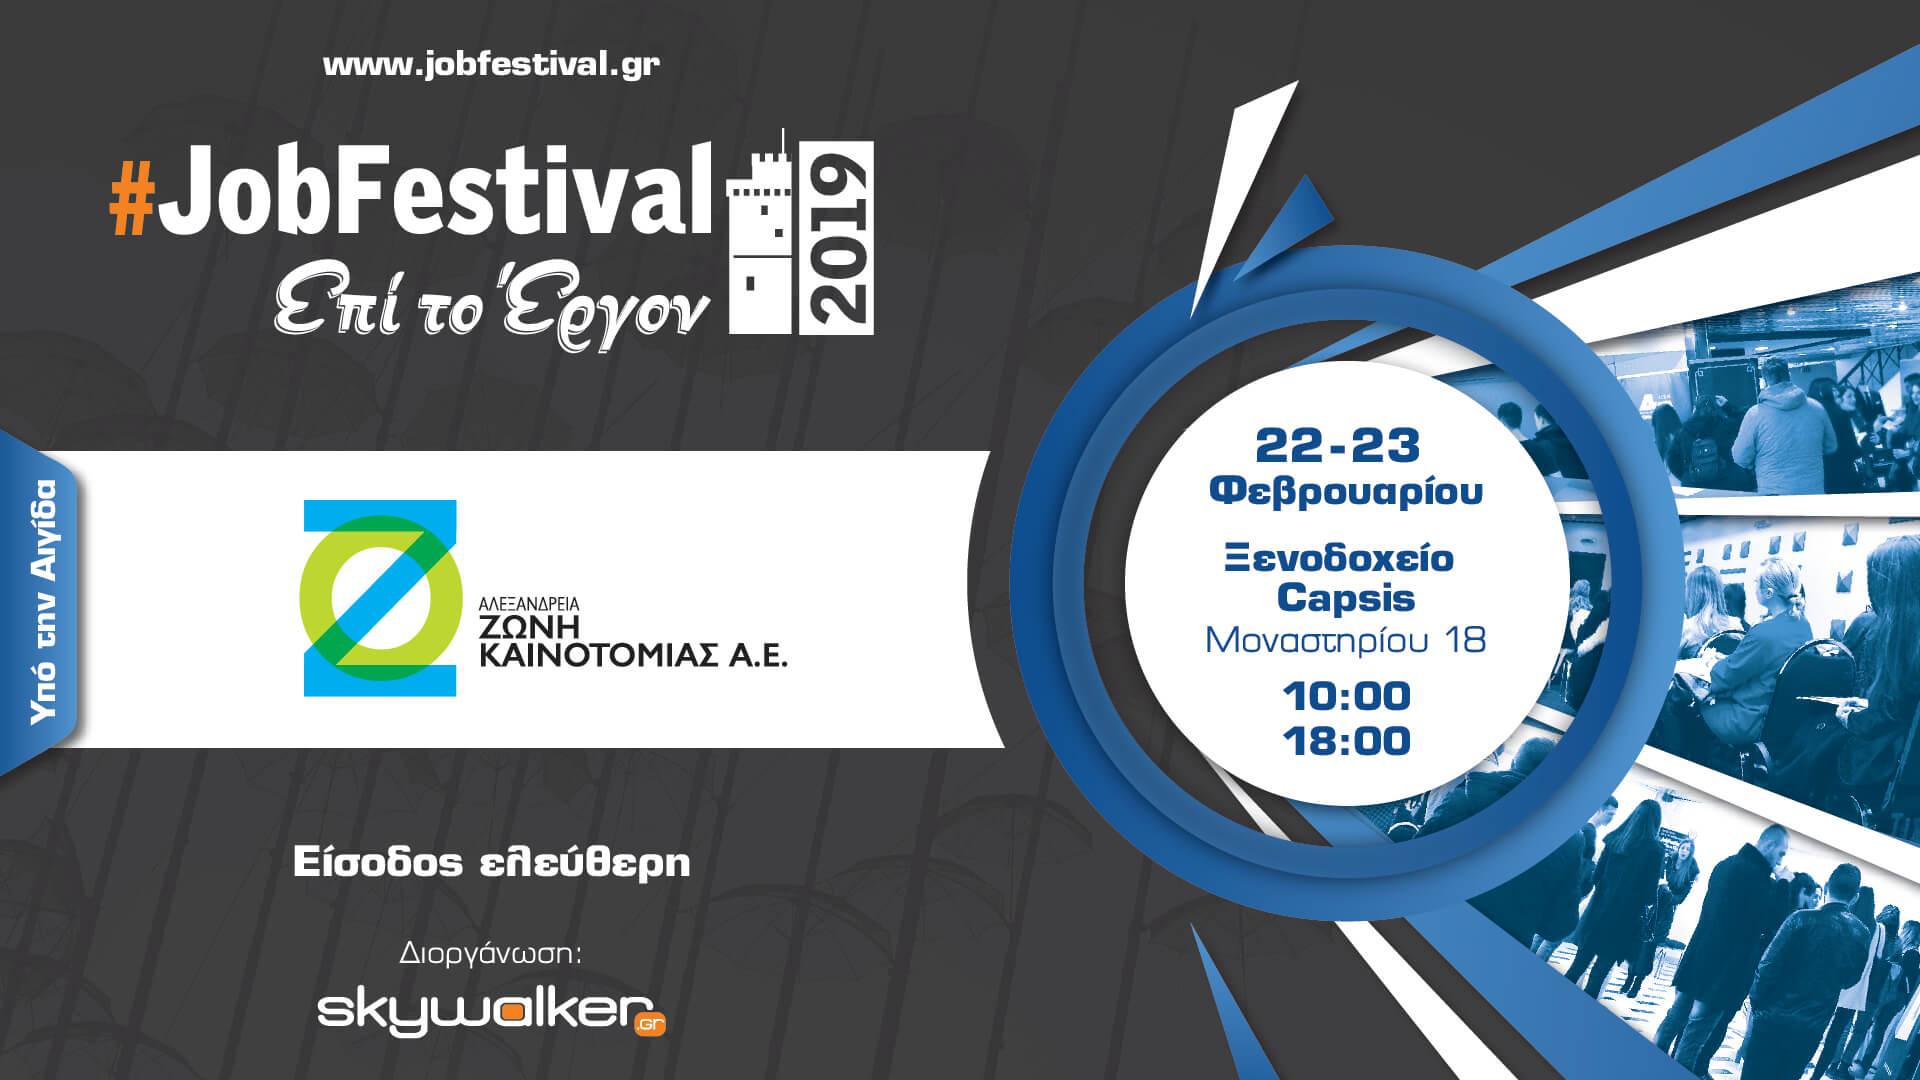 Thessaloniki #JobFestival 2019 – Υπό την αιγίδα της ΑΖΚ